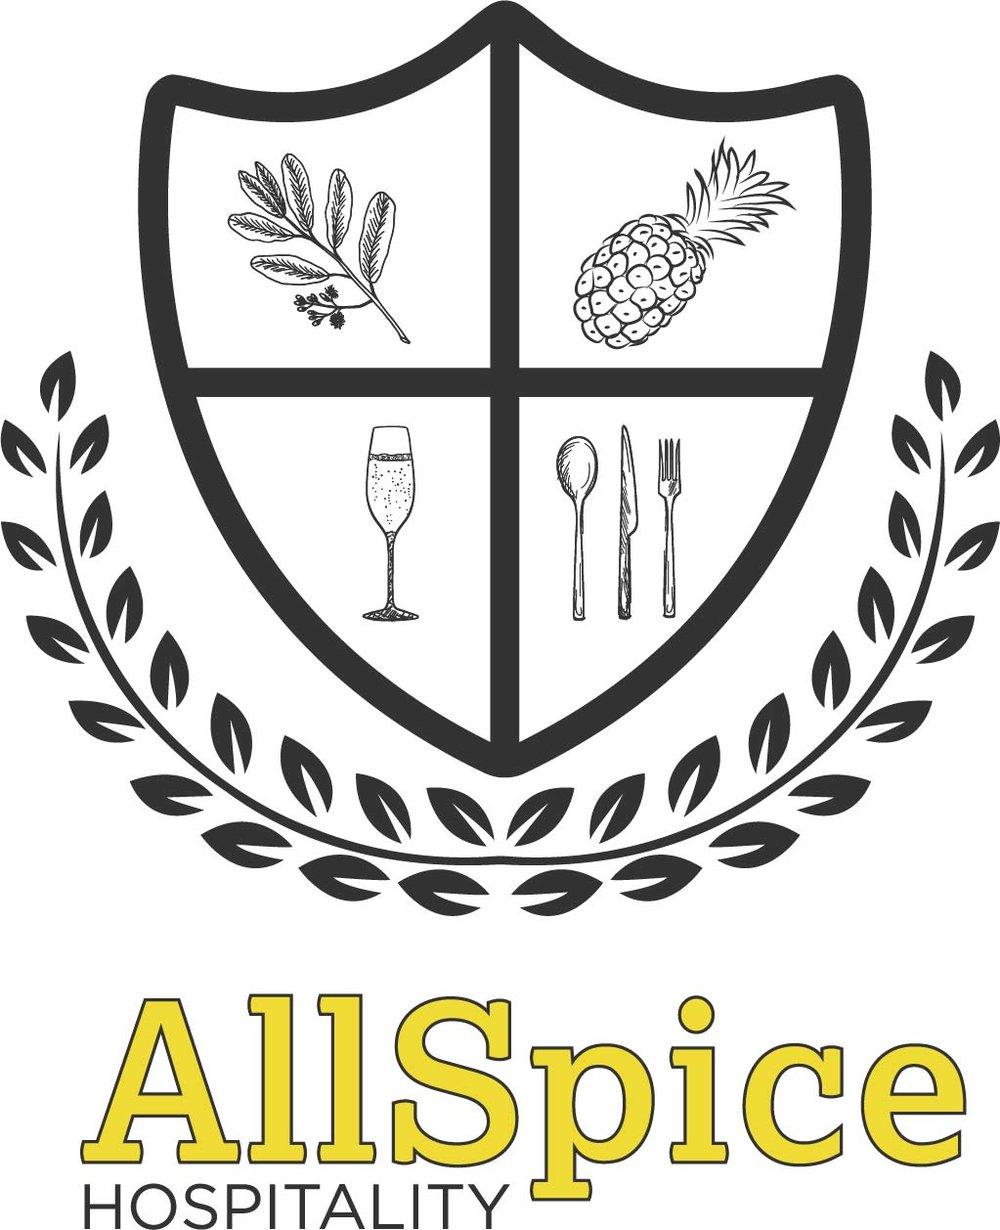 AllSpice Hospitality - Logo (2).jpg